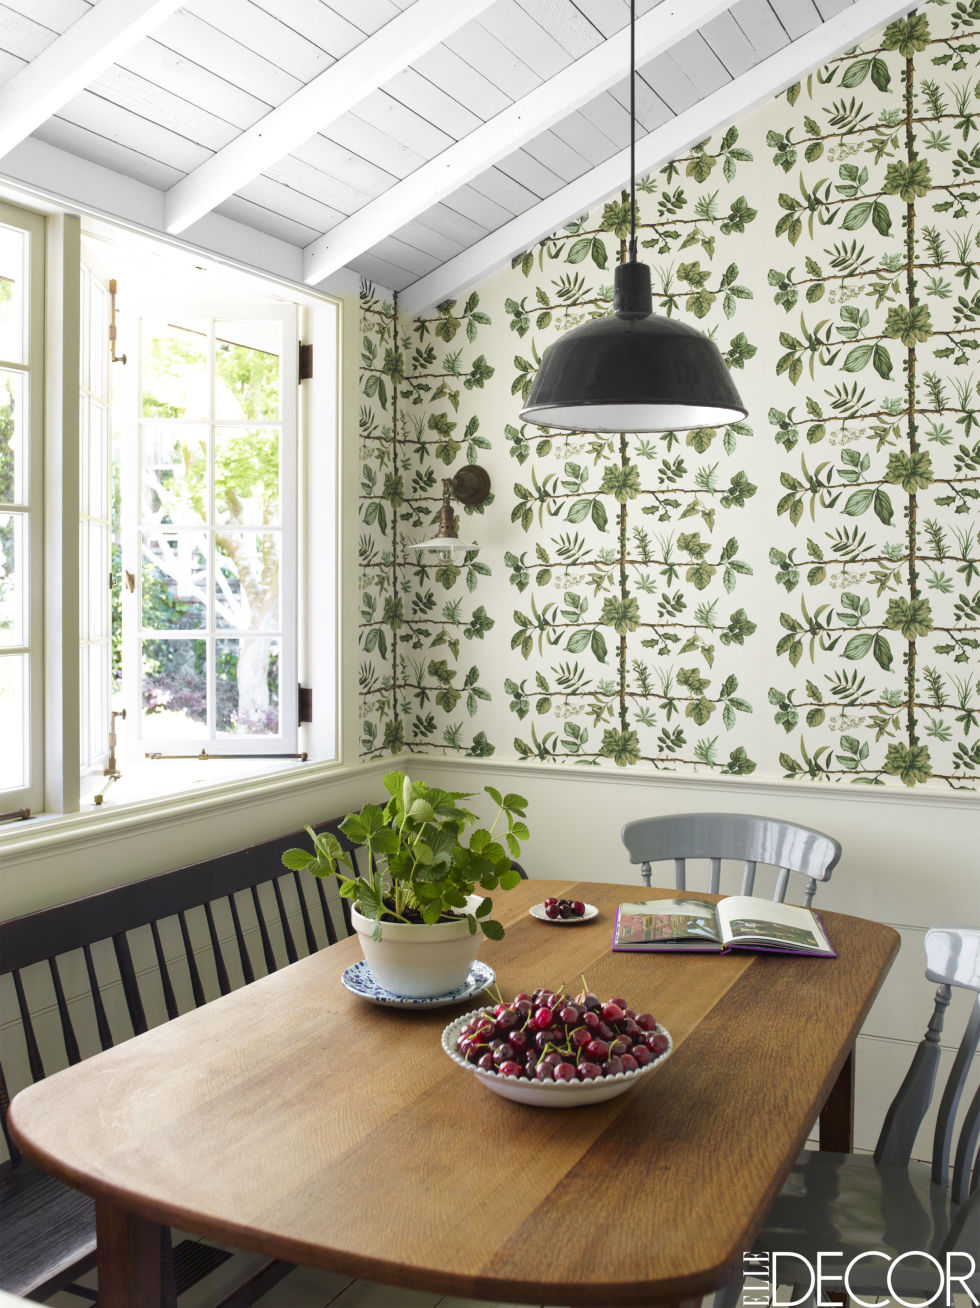 Pierre Frey wallpaper in the kitchen